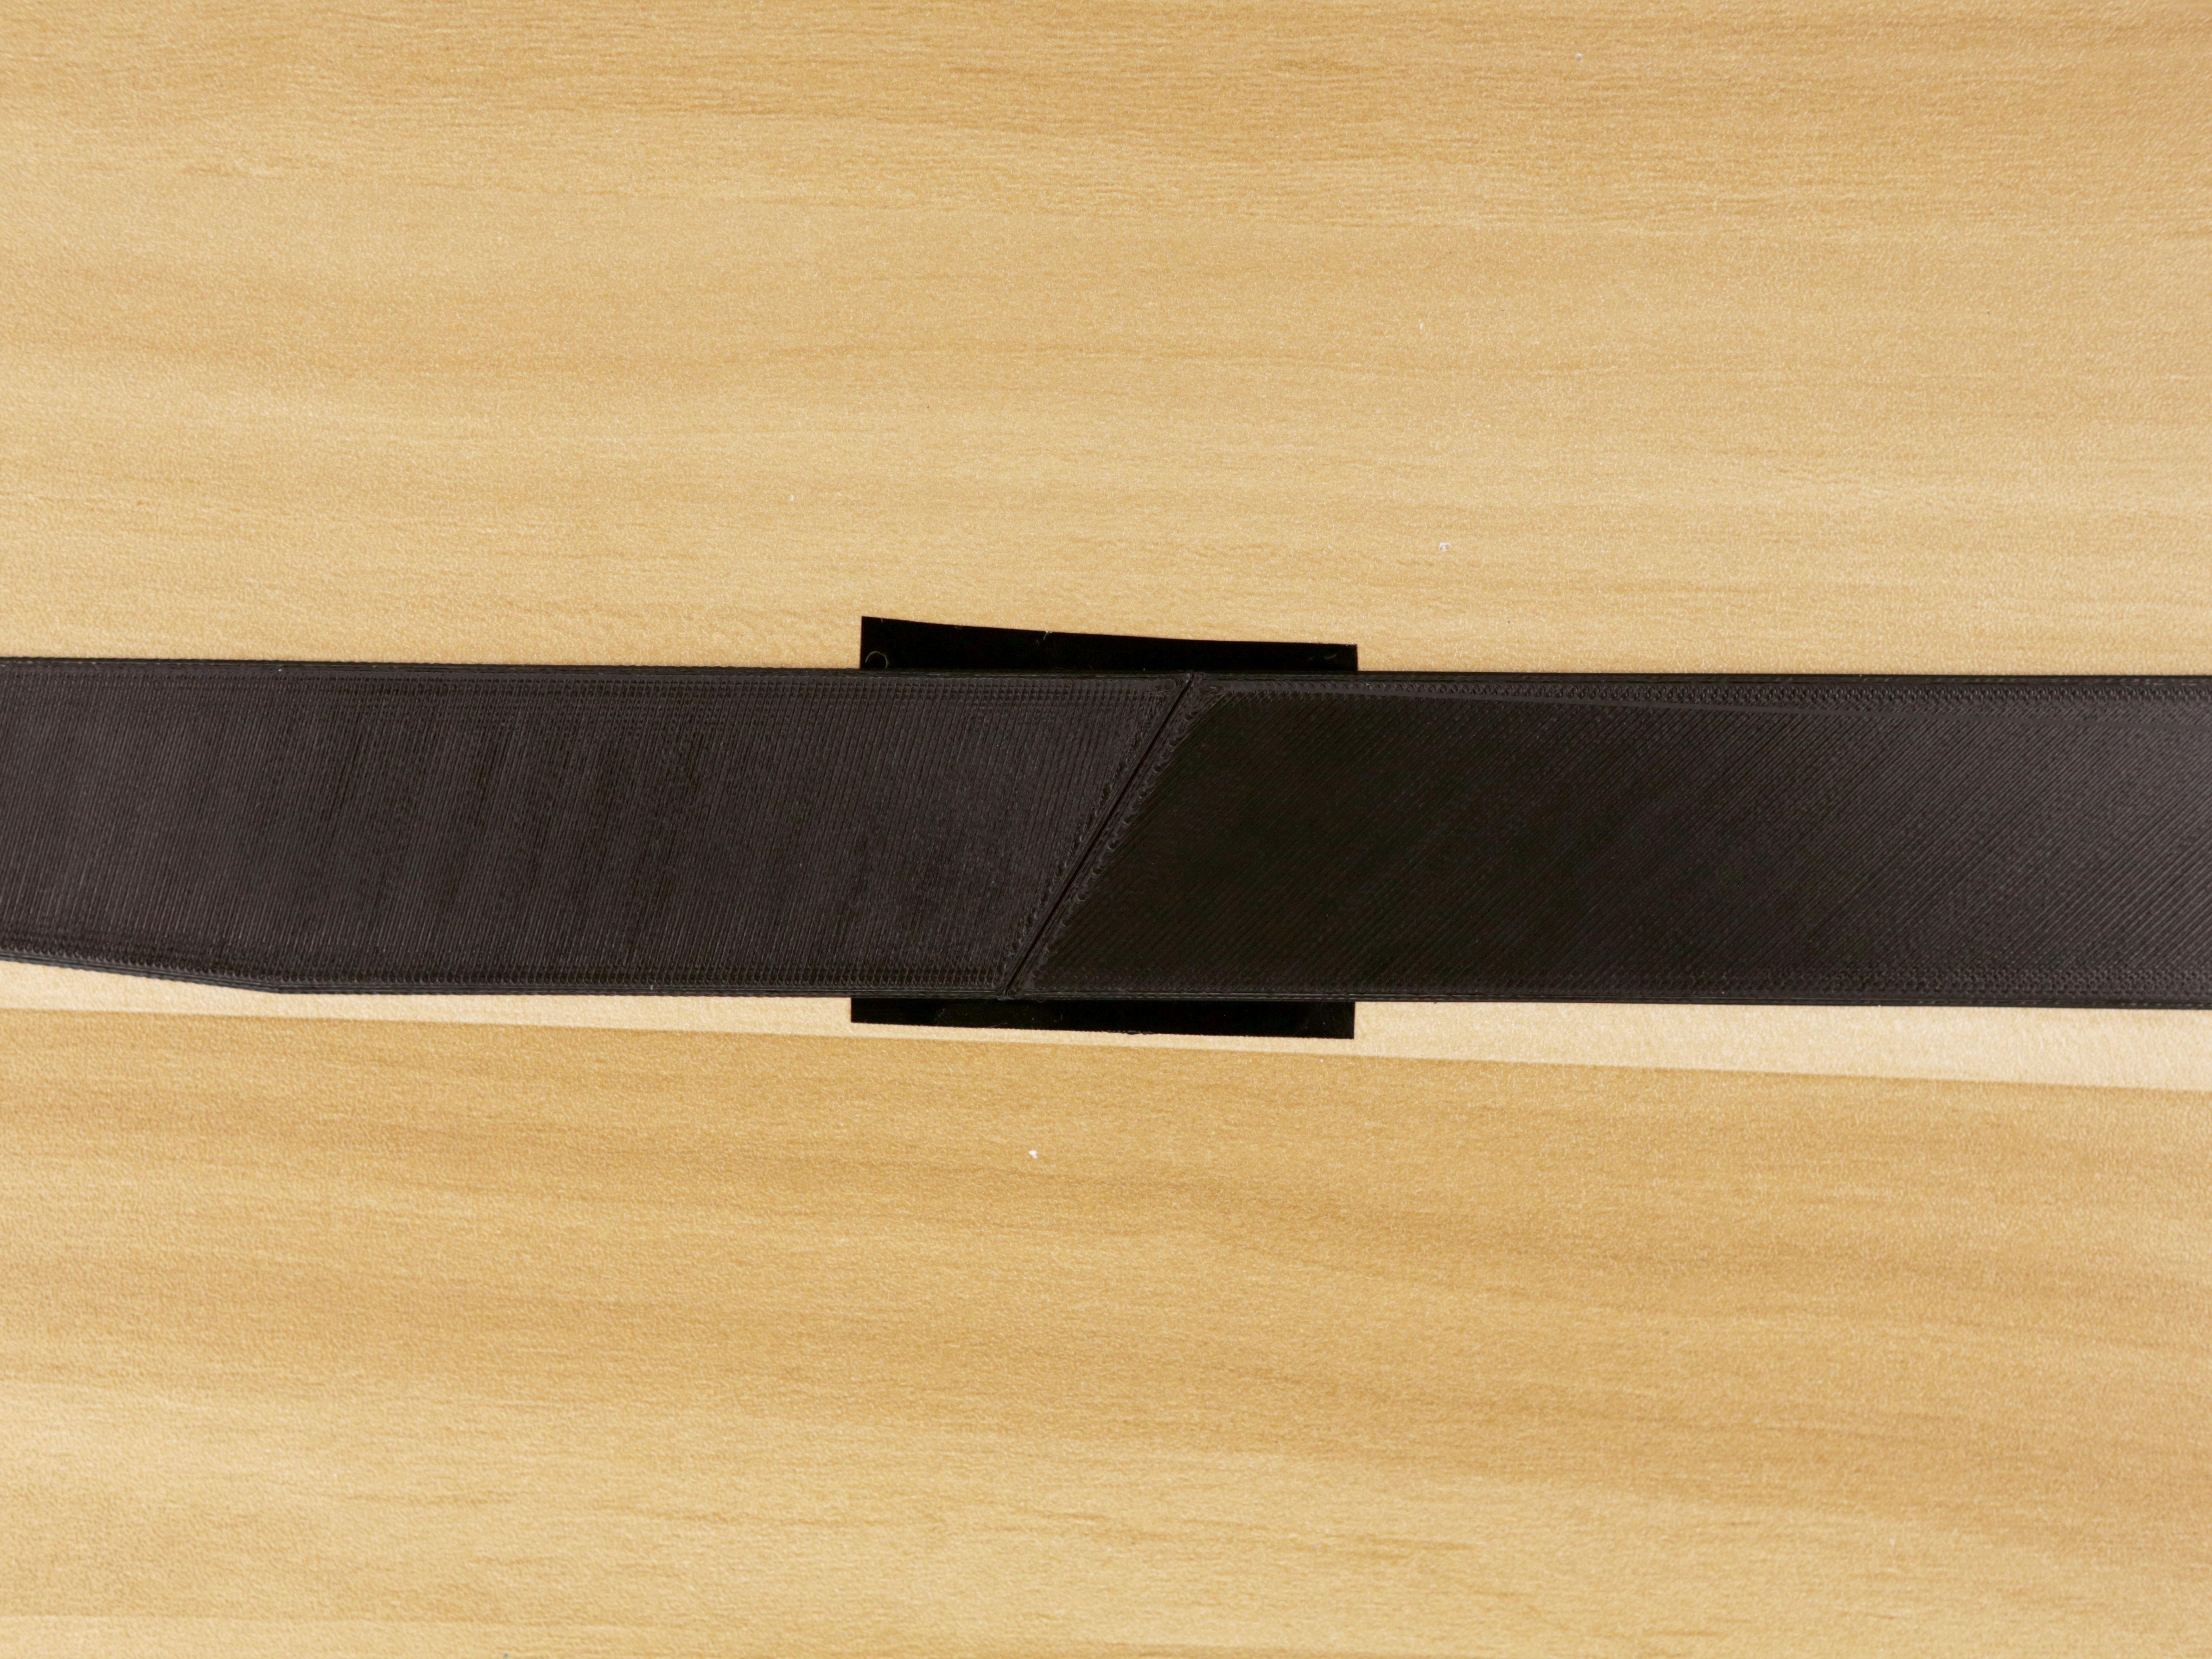 3d_printing_blade-cover-vinyl-stick.jpg